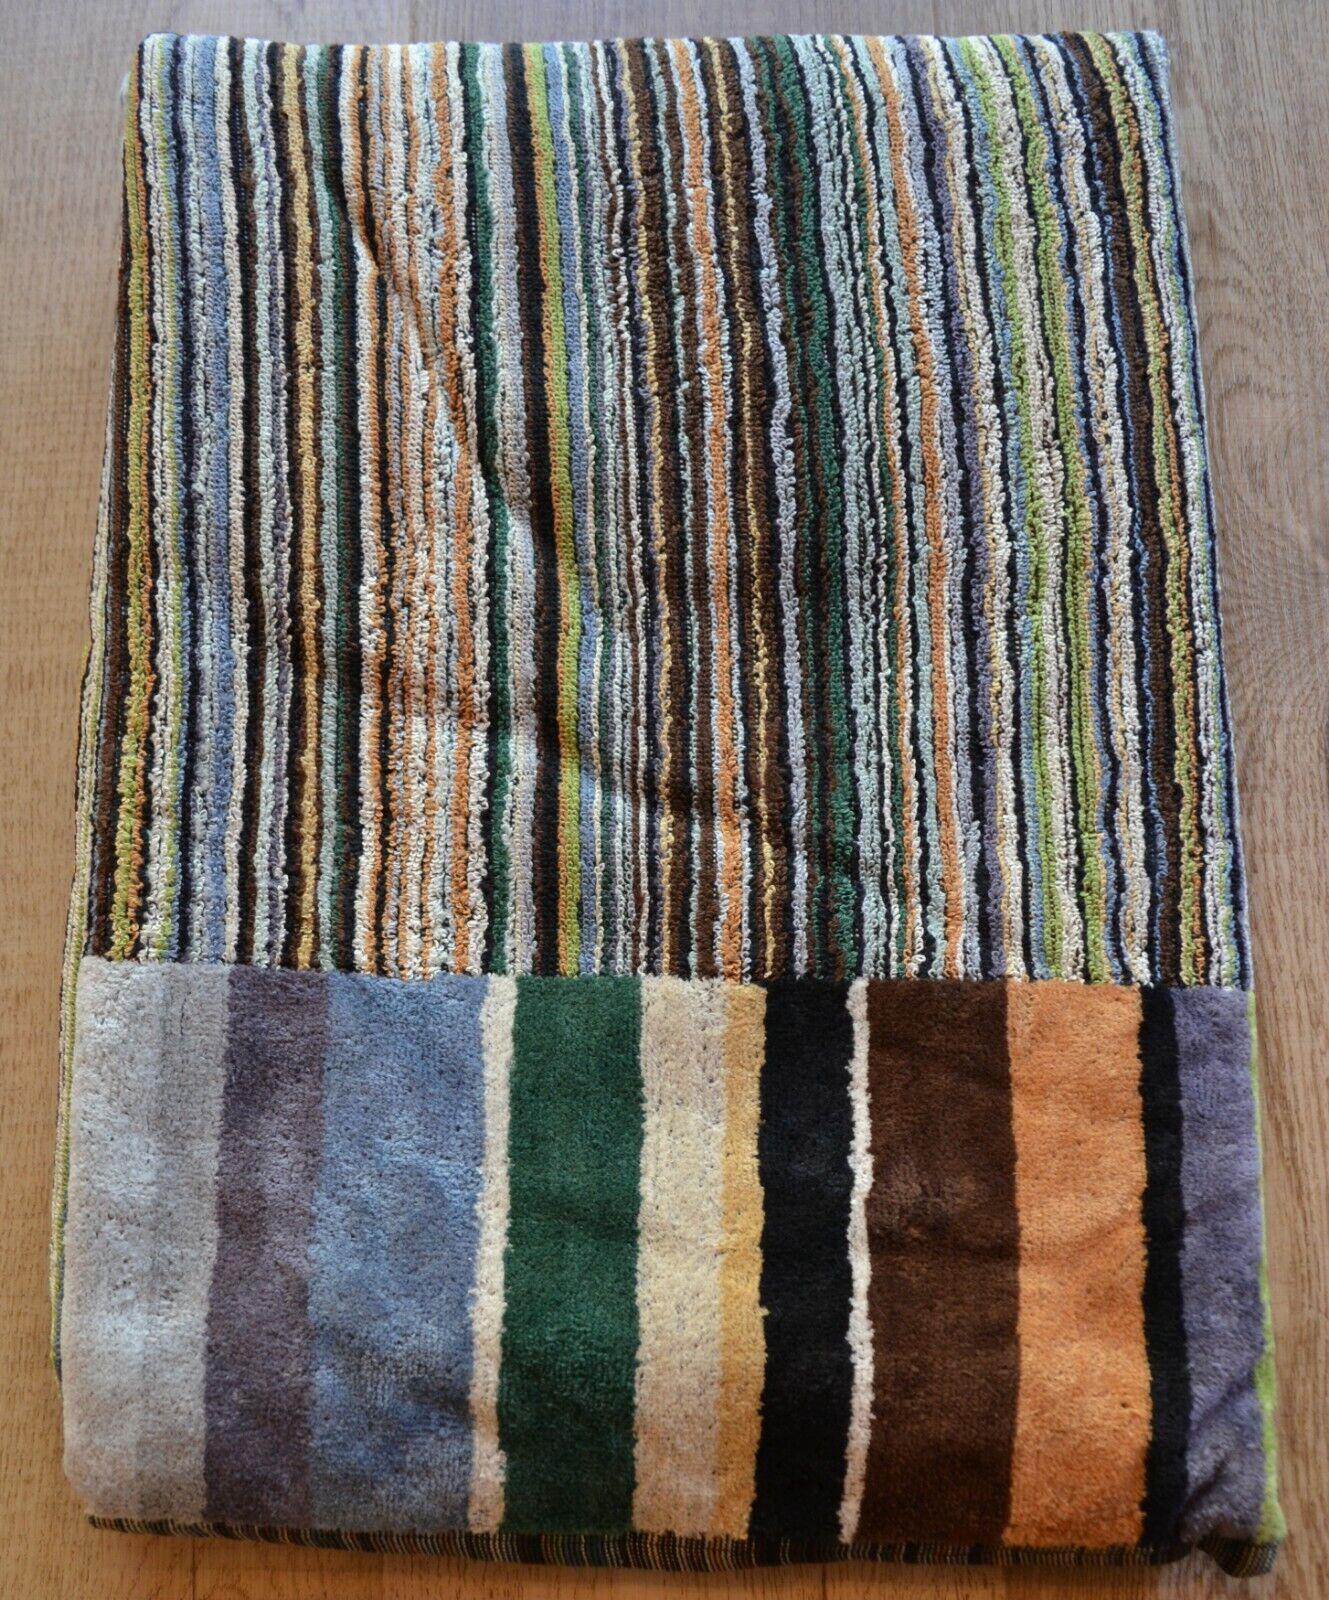 Missoni Home Hans Striped Bath Sheet Towel.  Cotton Terry